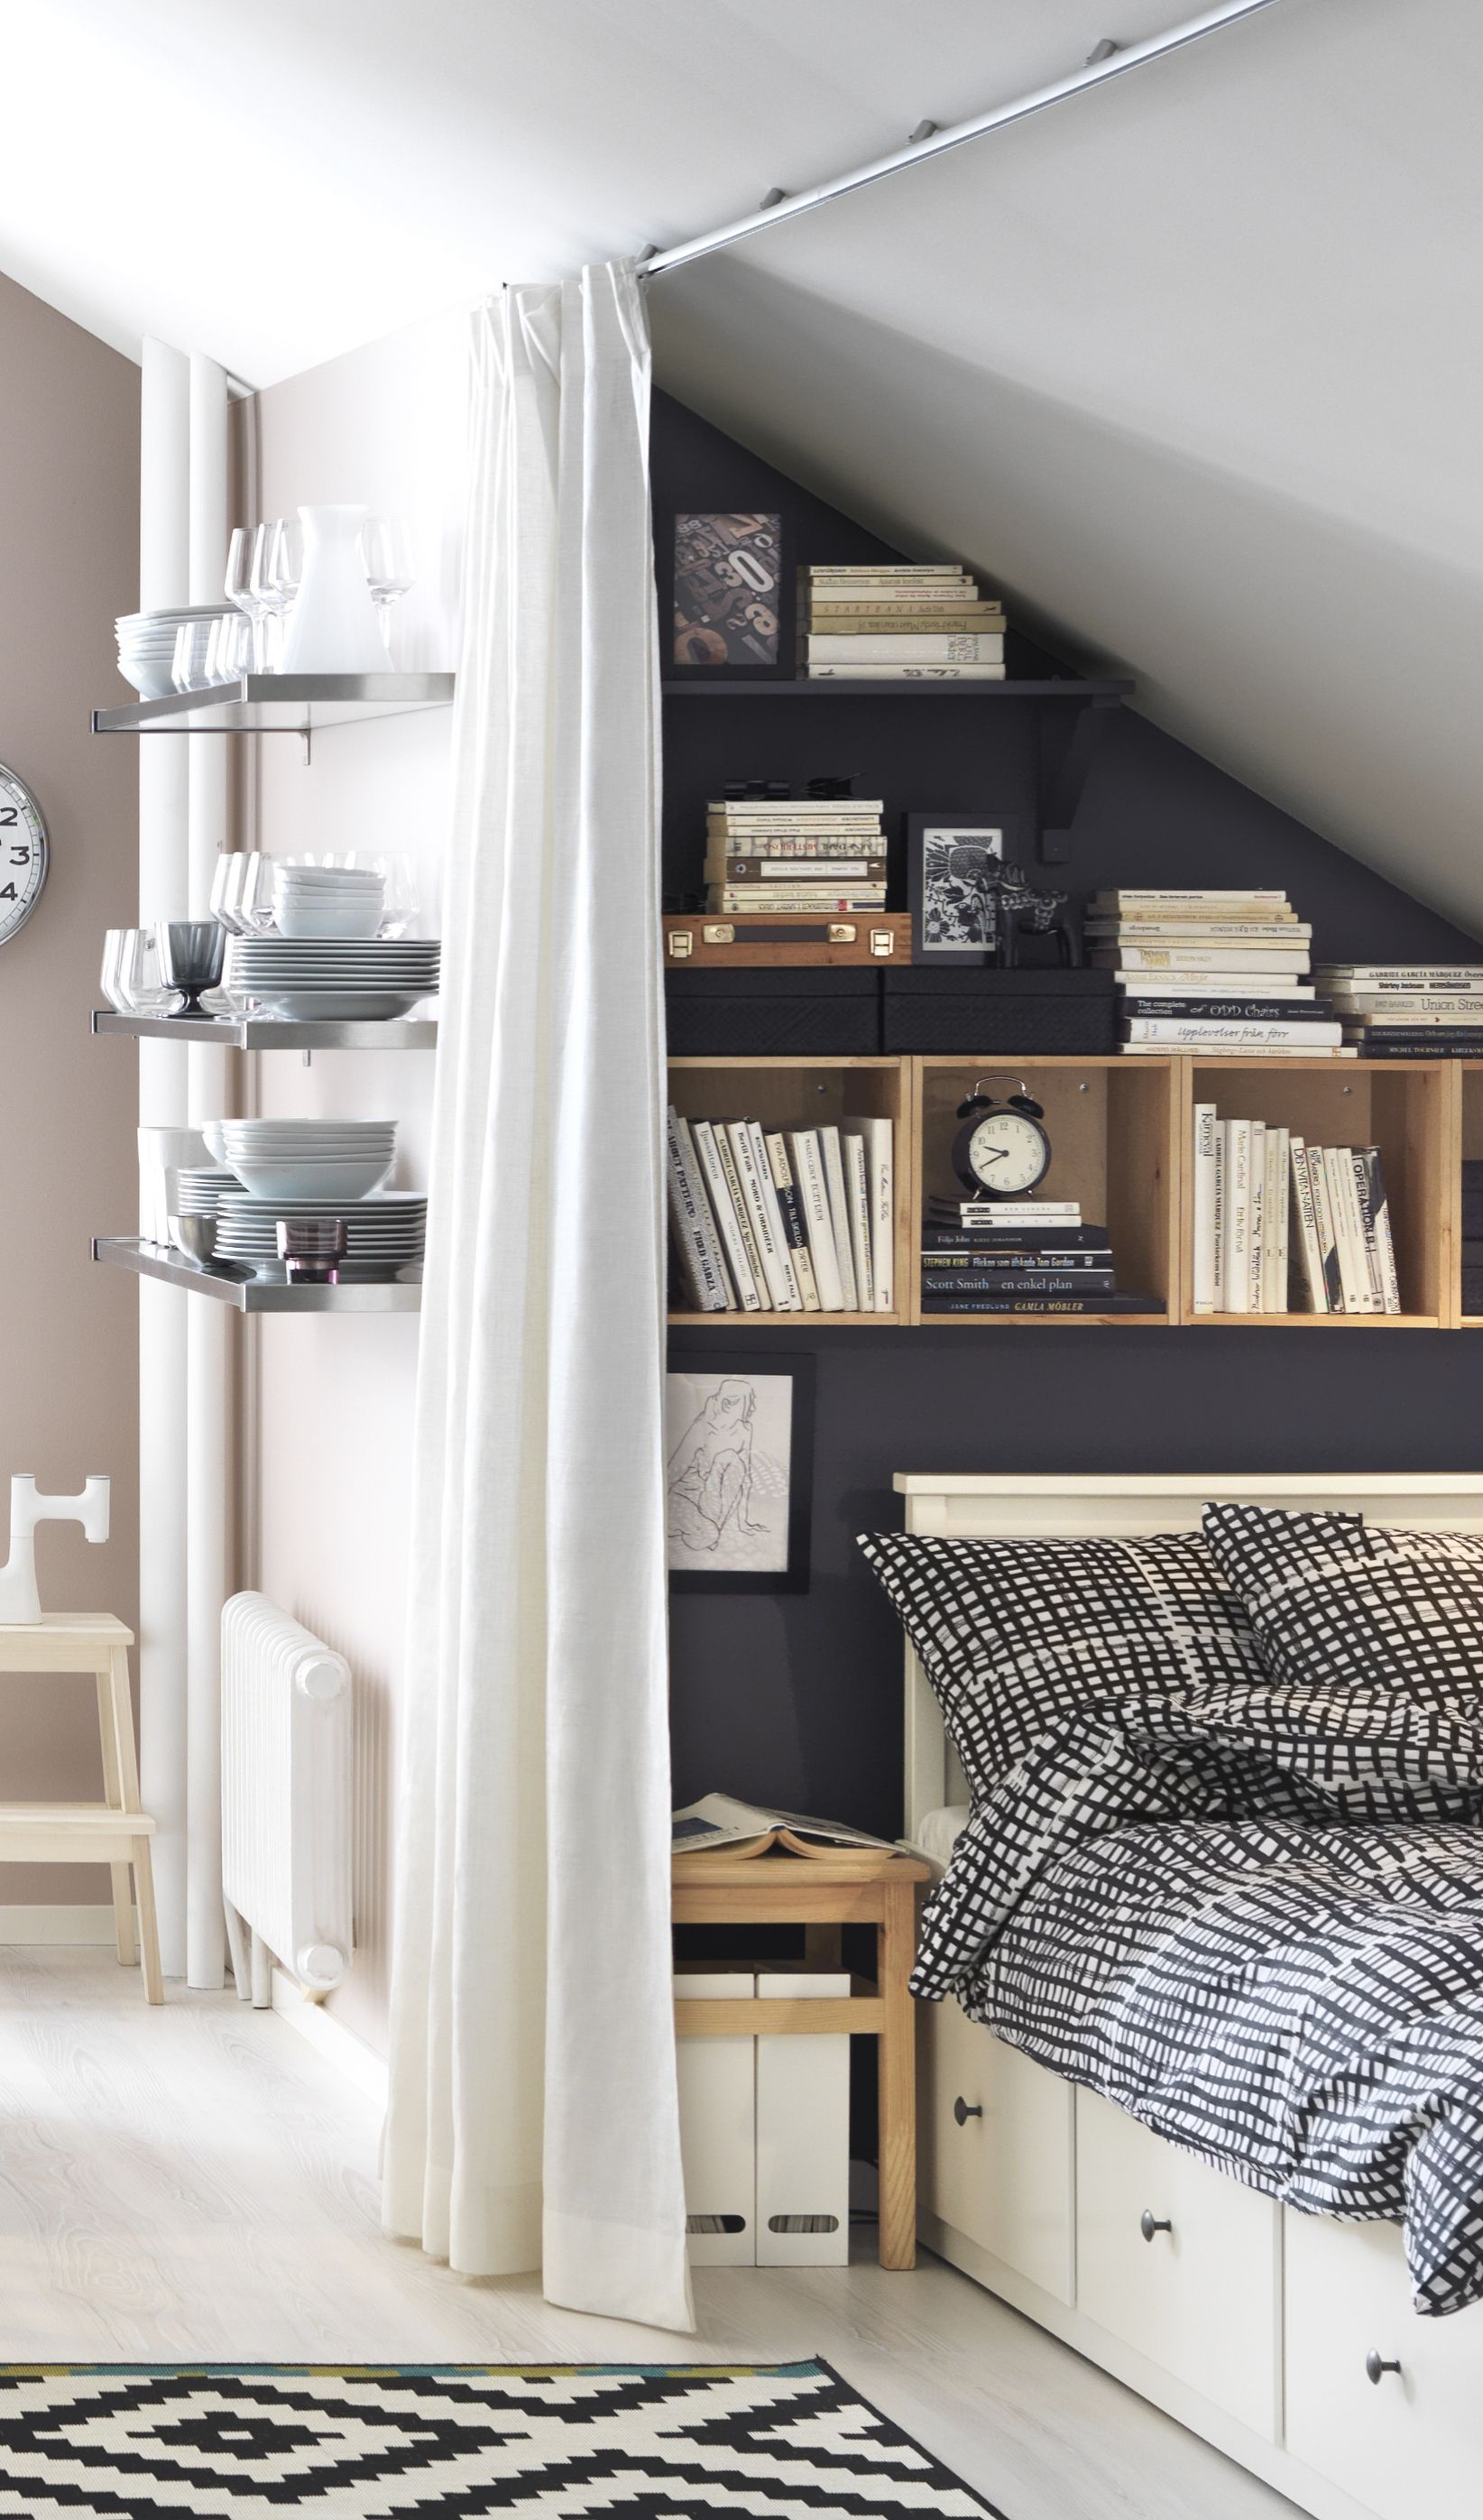 Ikea Us Furniture And Home Furnishings Tiny Bedroom Home